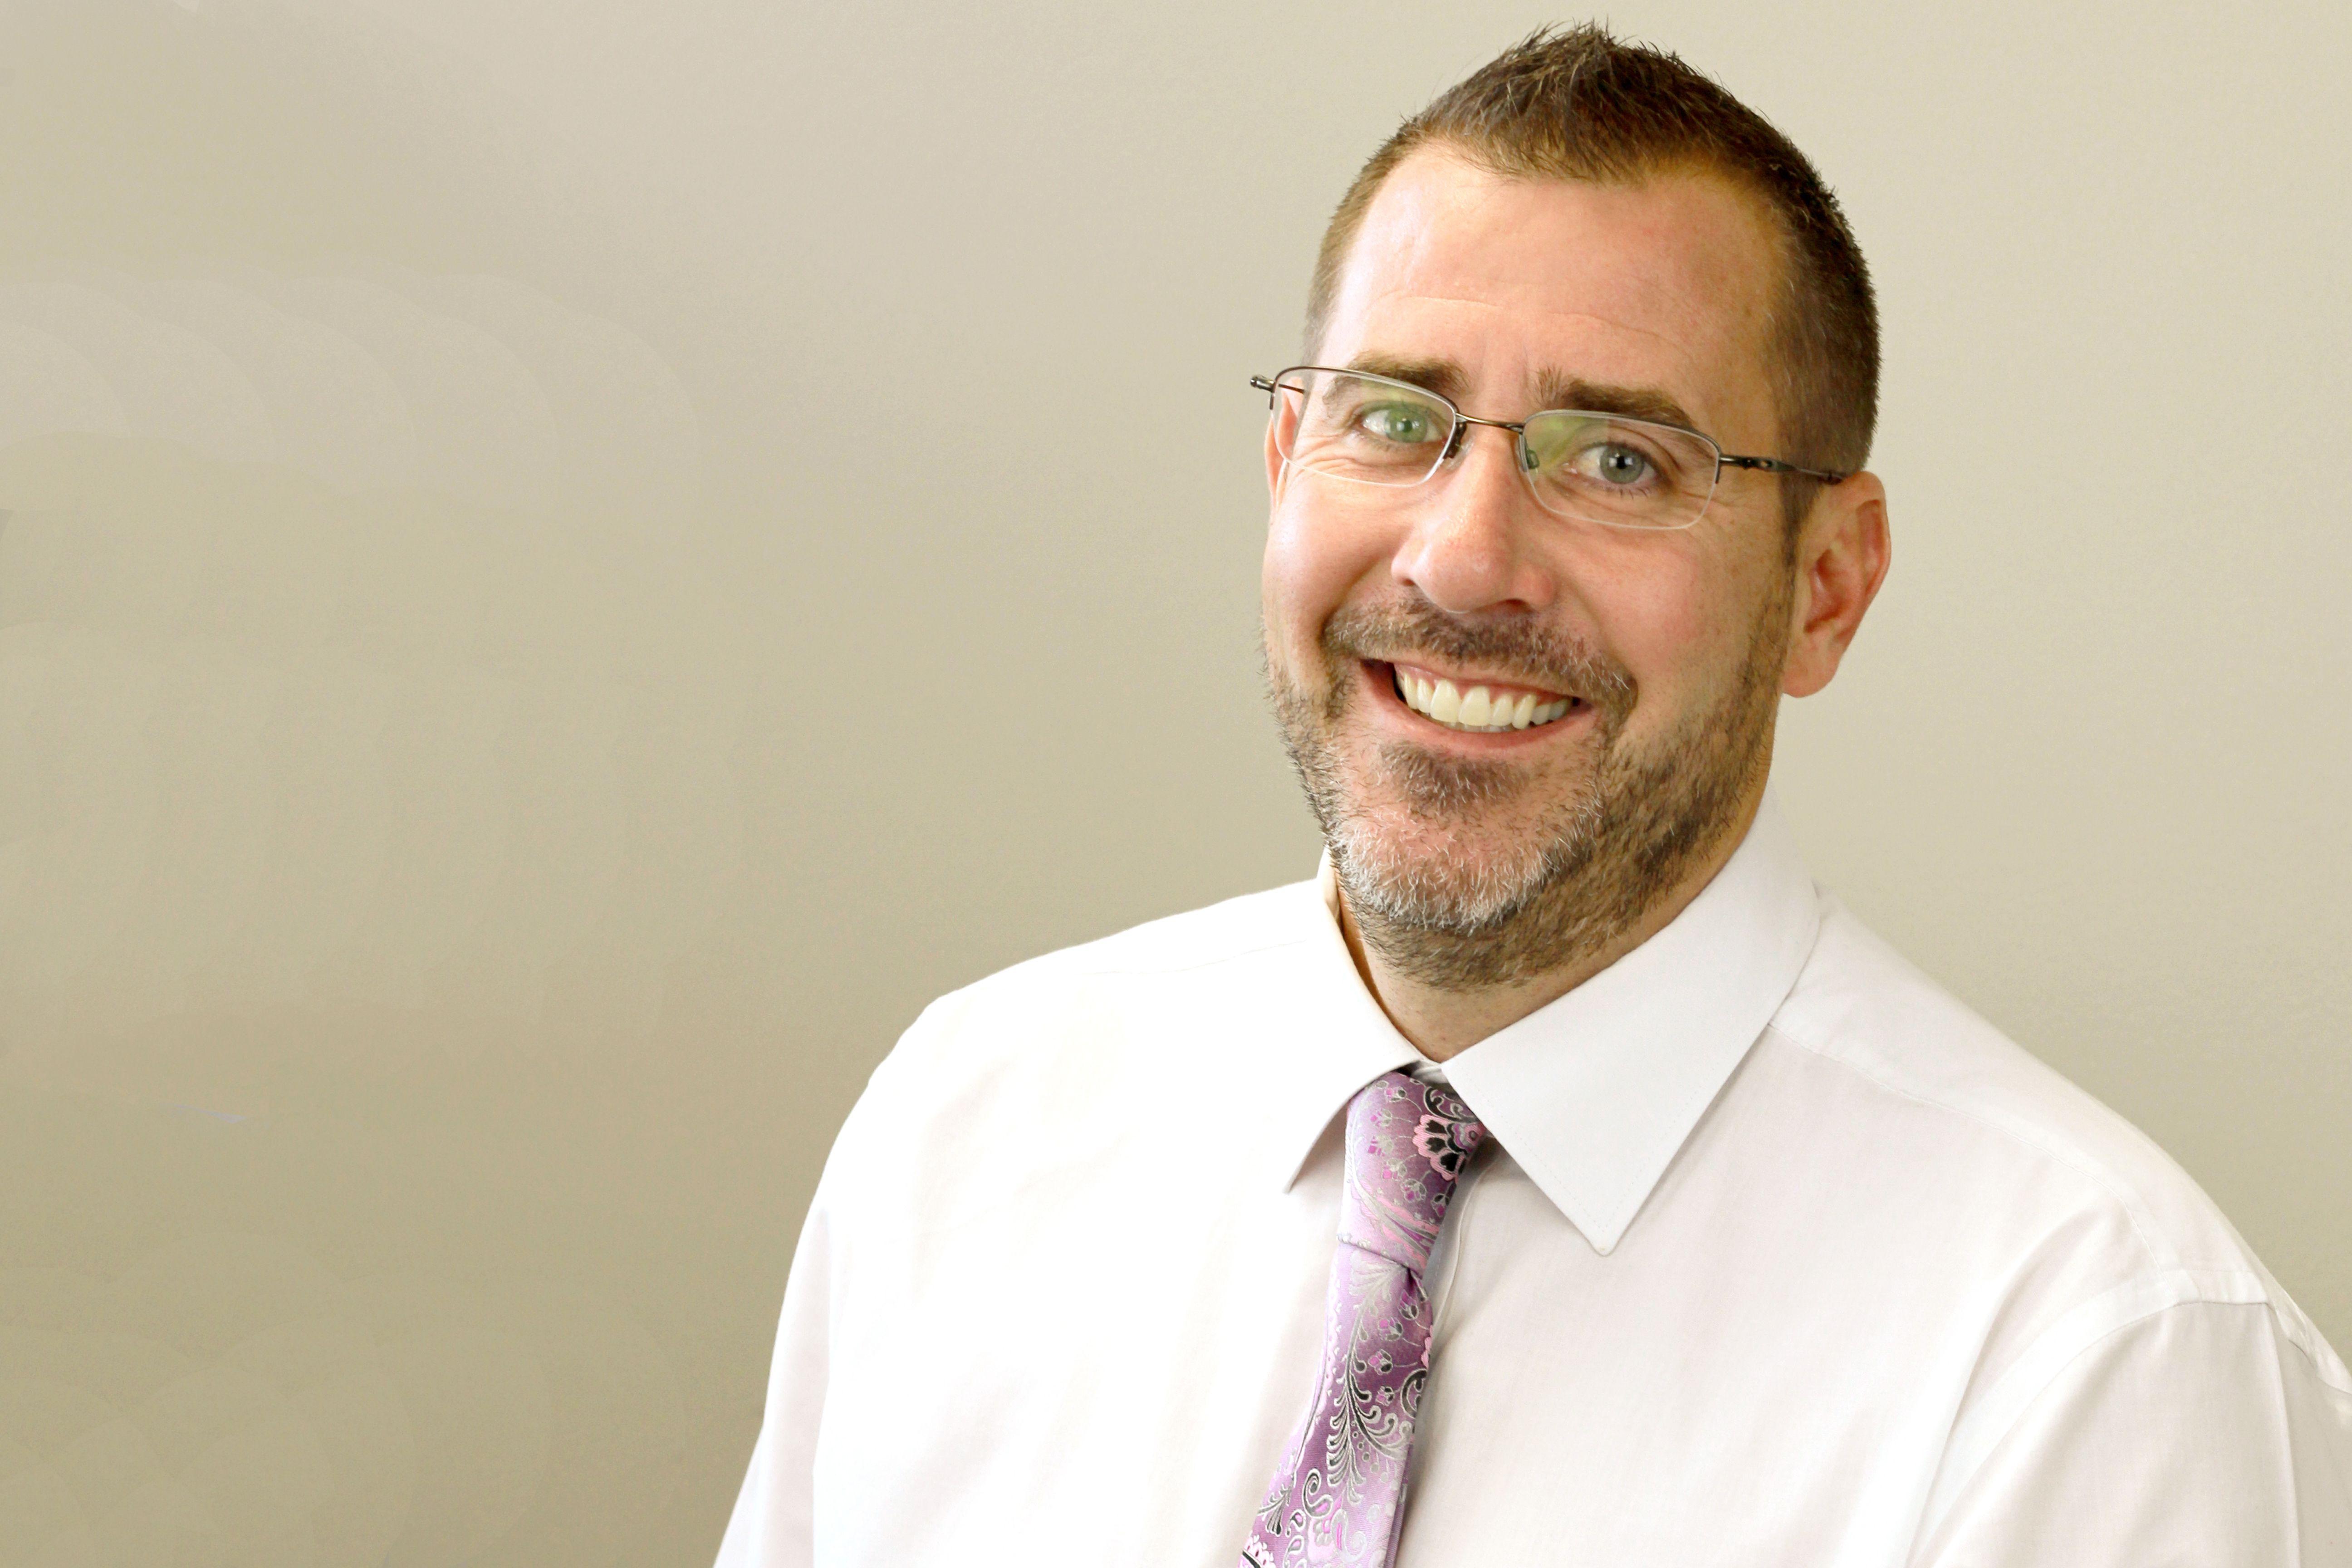 Mark Beller - Director of Kids Network